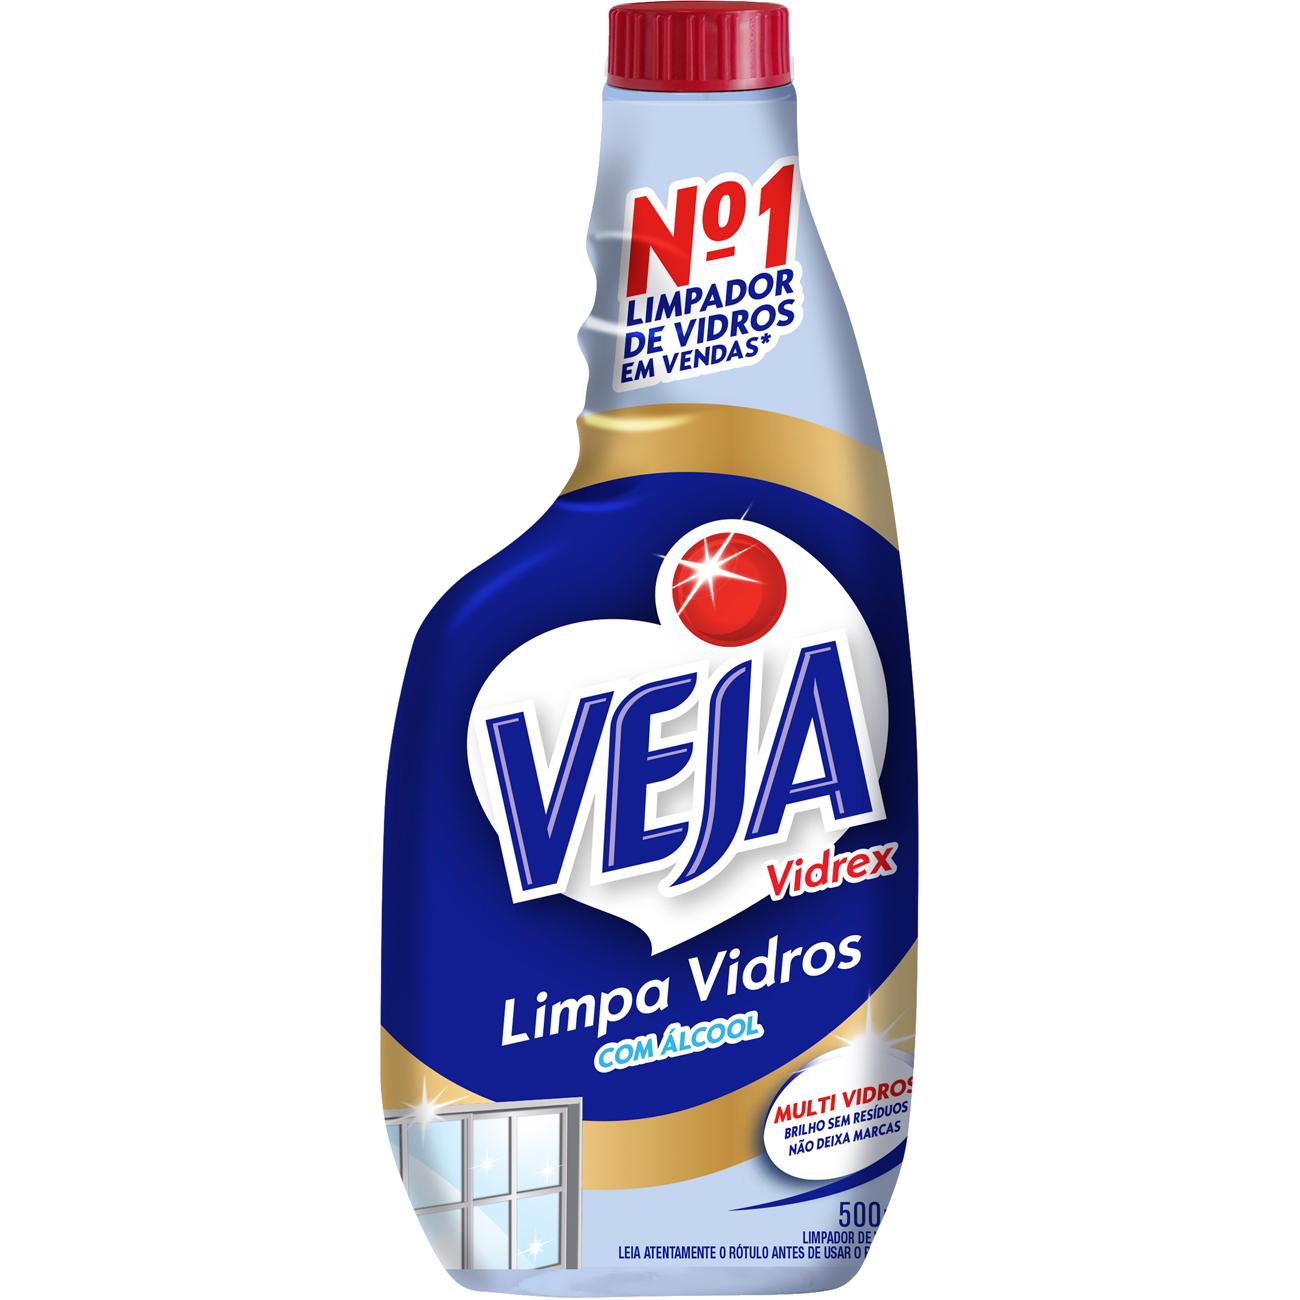 Limpa Vidro Veja Vidrex 500Ml Refil